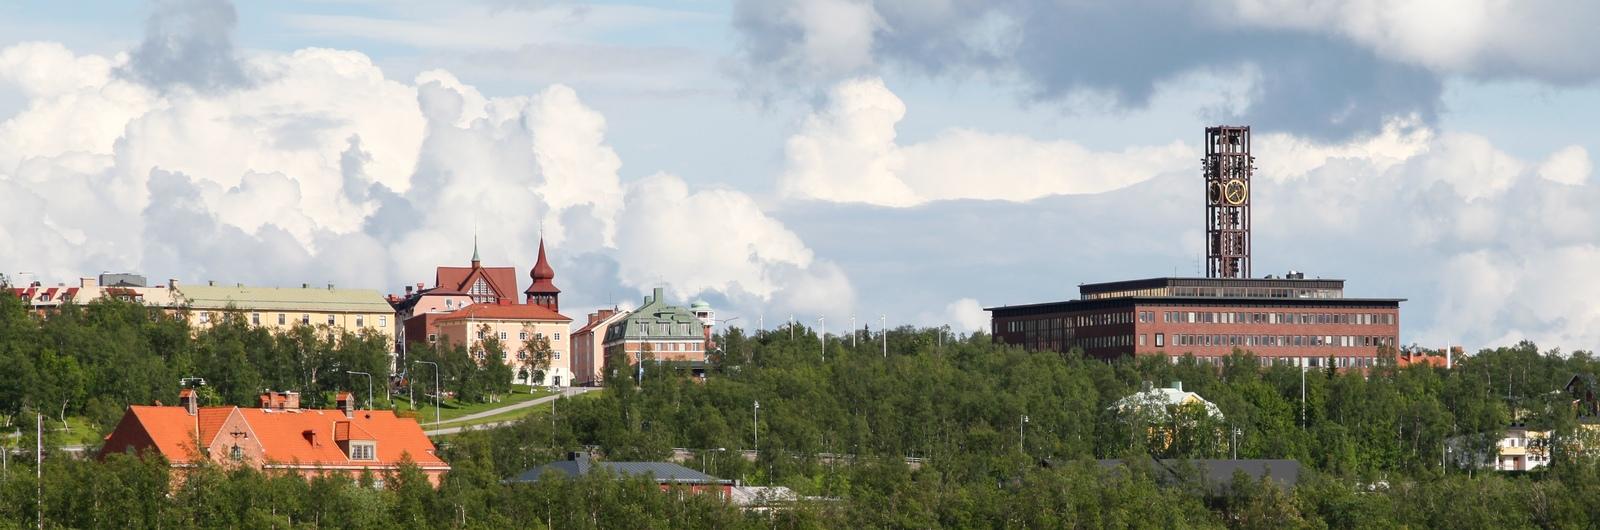 kiruna city header